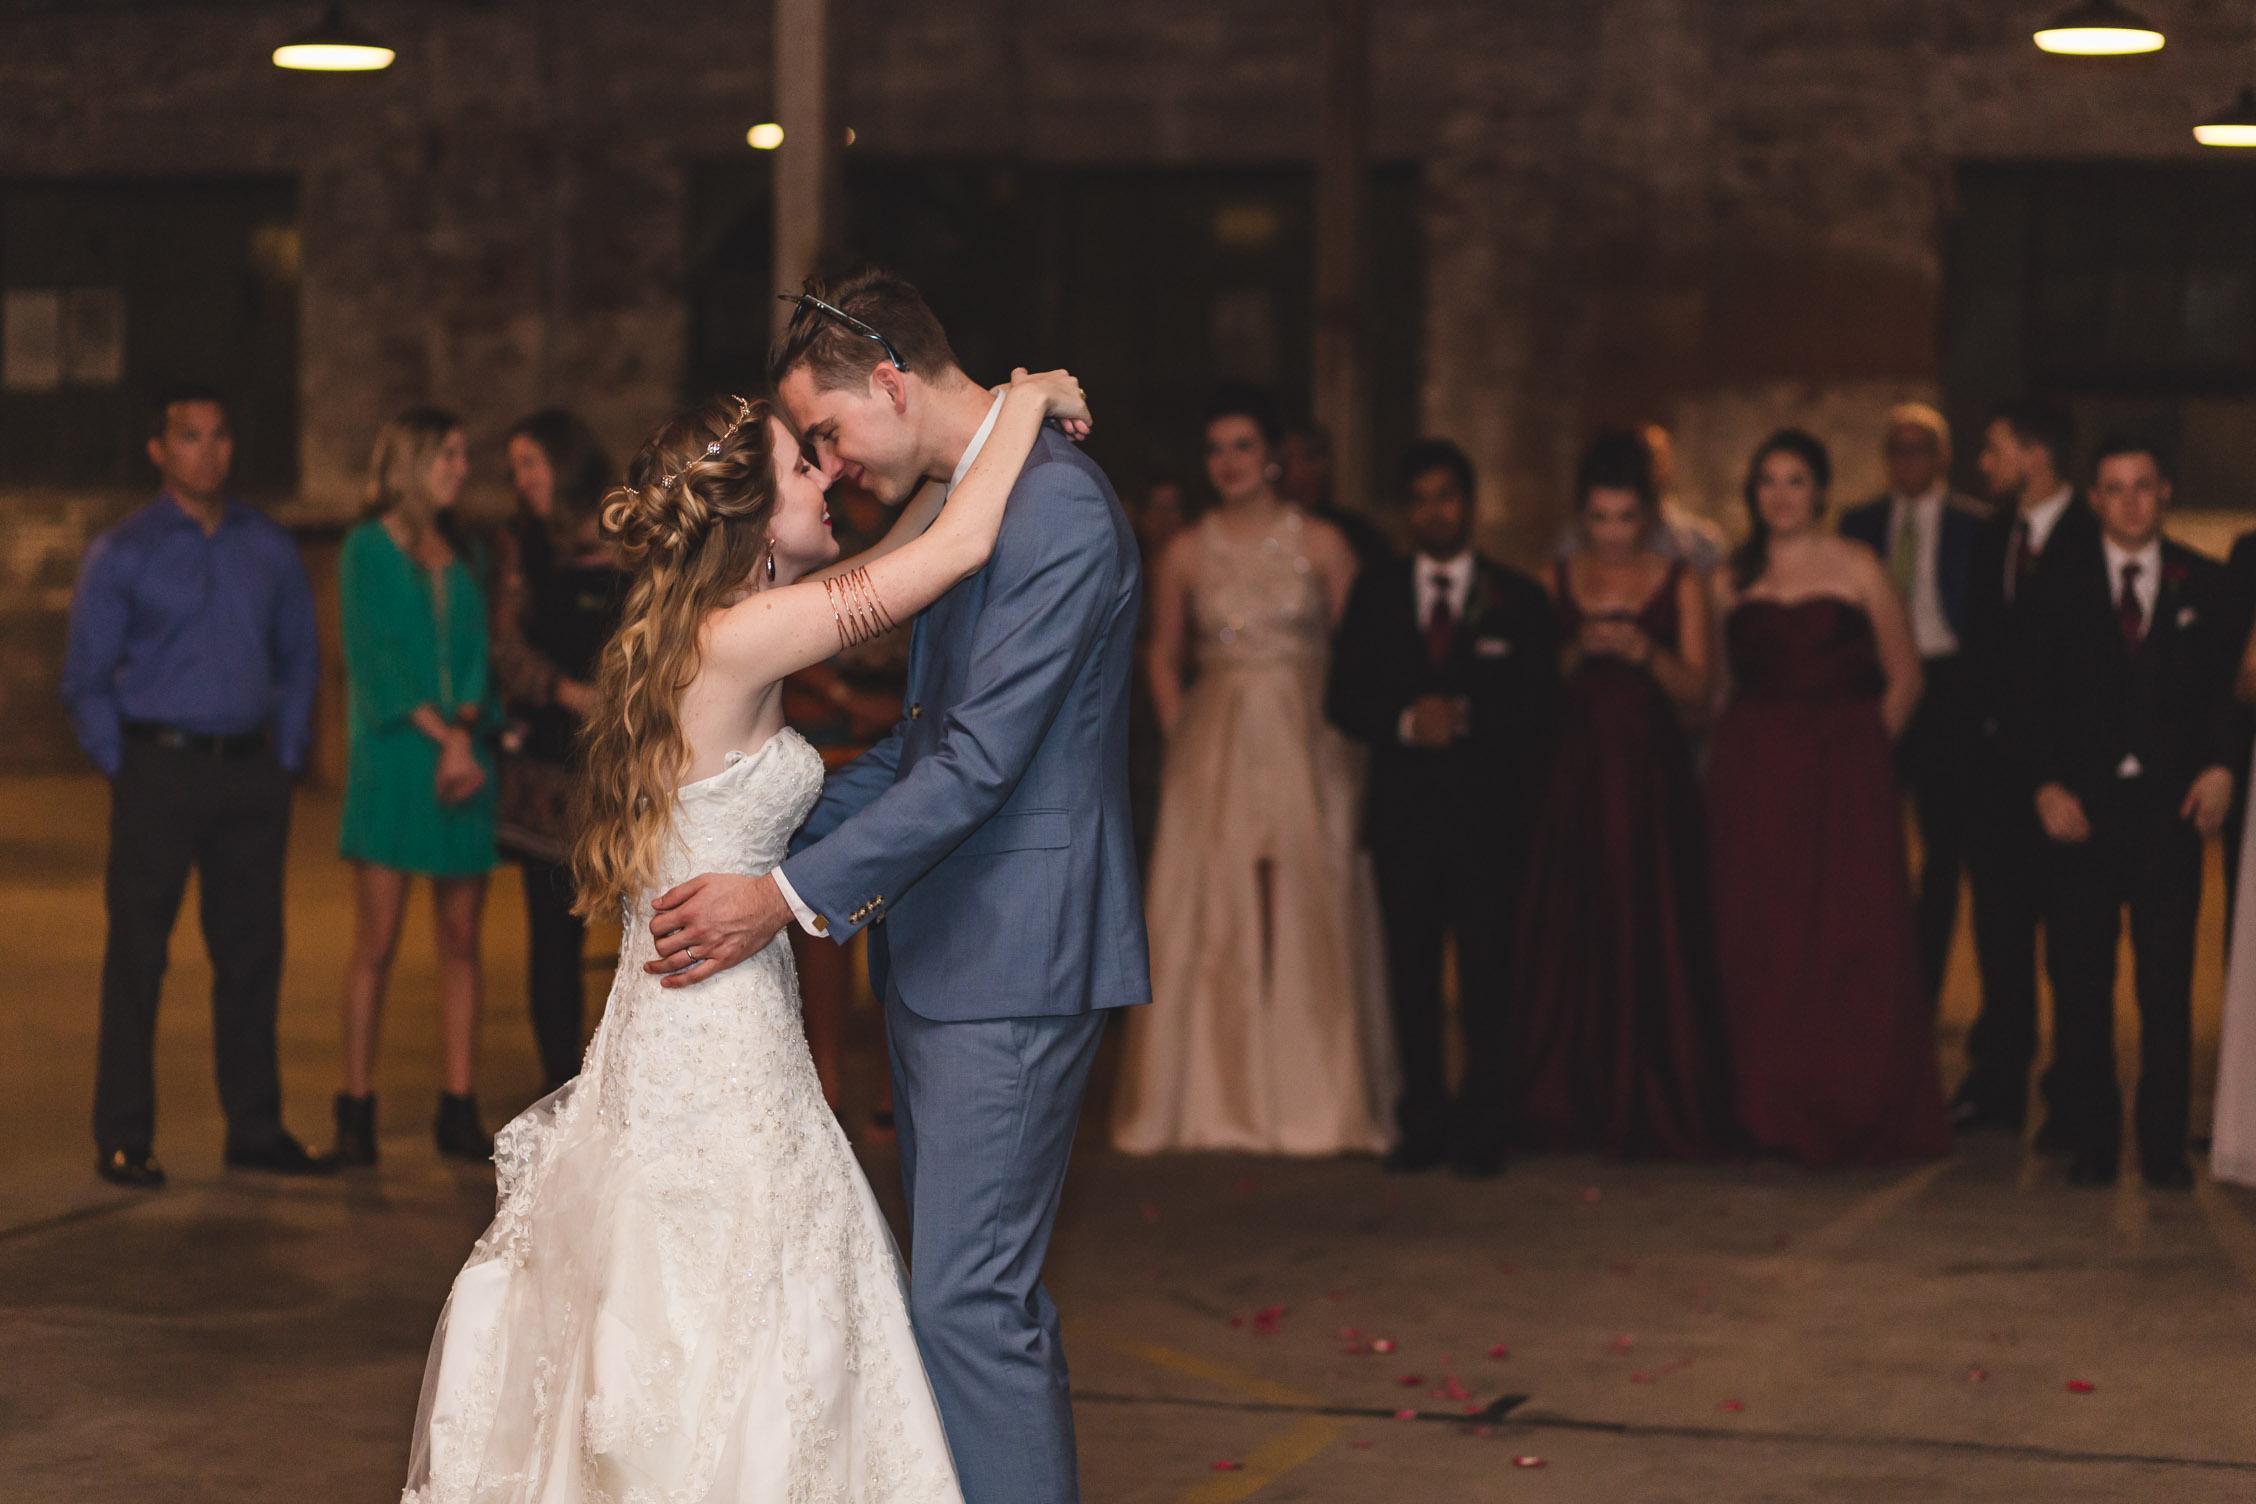 Adam-Szrmack-The-Glass-Factory-Wedding-136.jpg